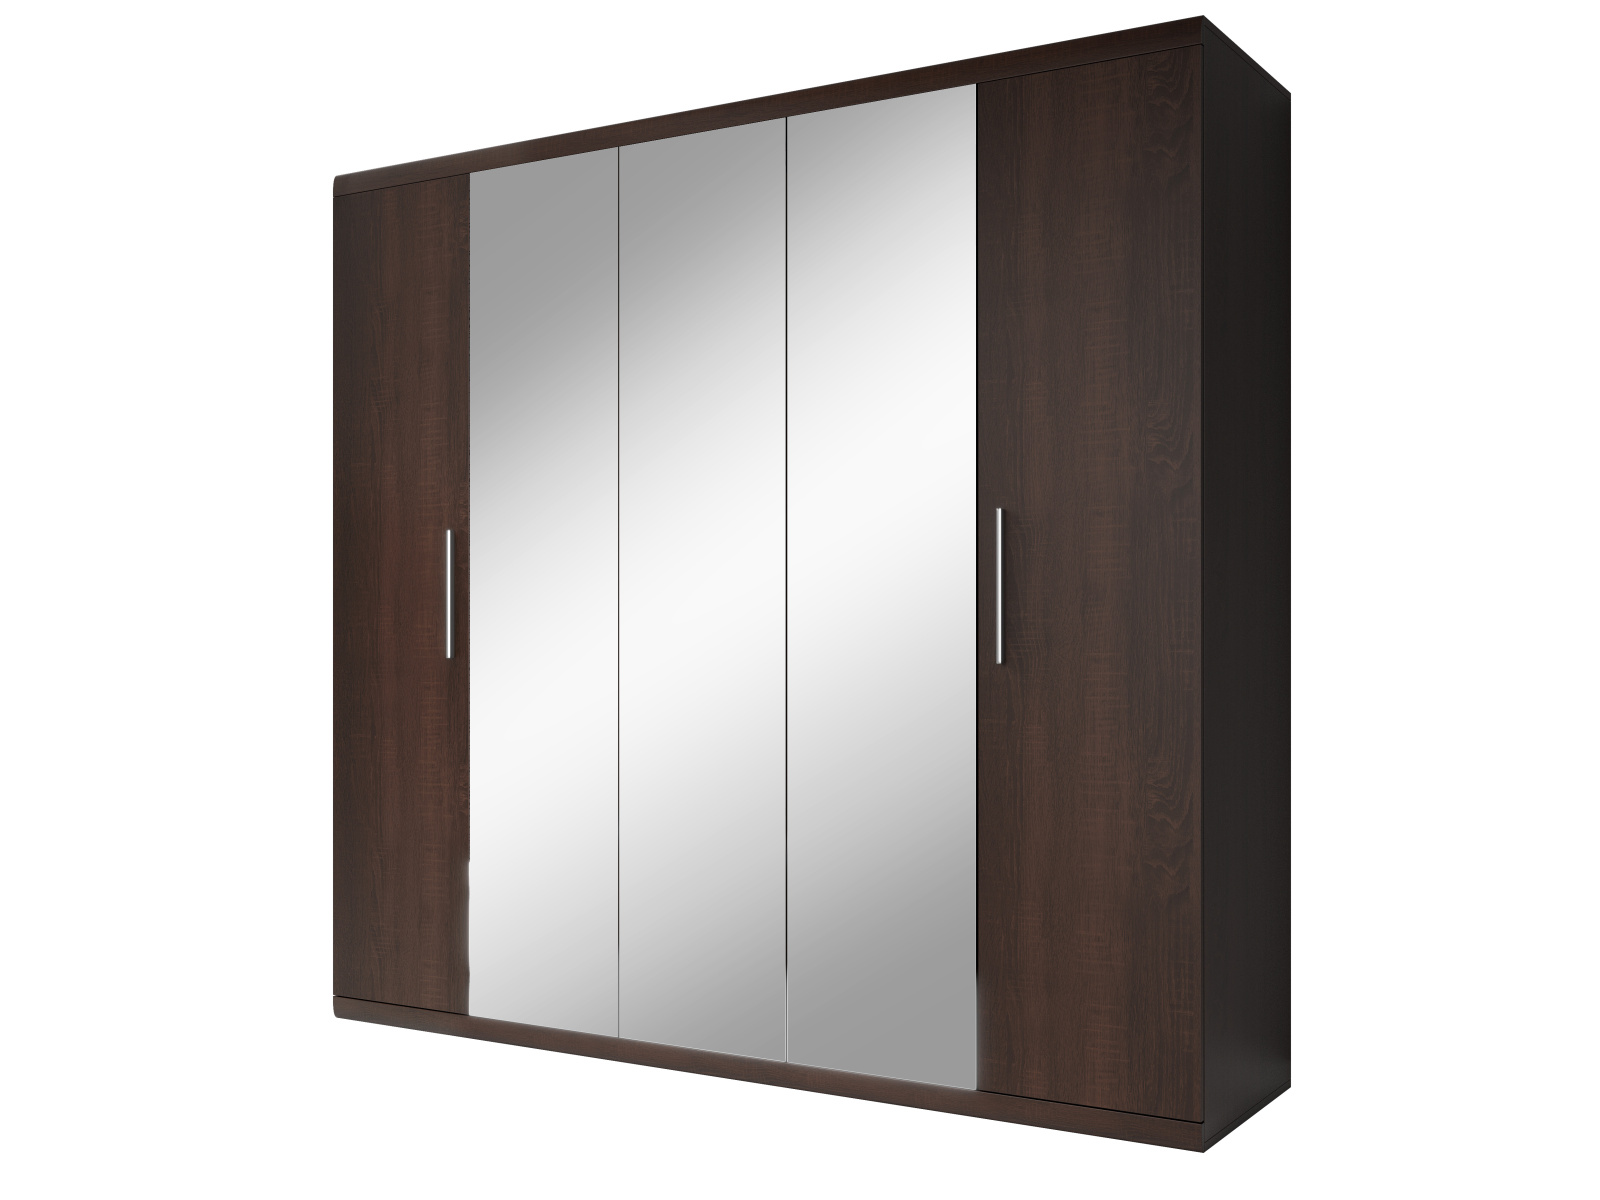 Smartshop MESTRE šatní skříň se zrcadlem 225 TYP 21, dub sonoma tmavý